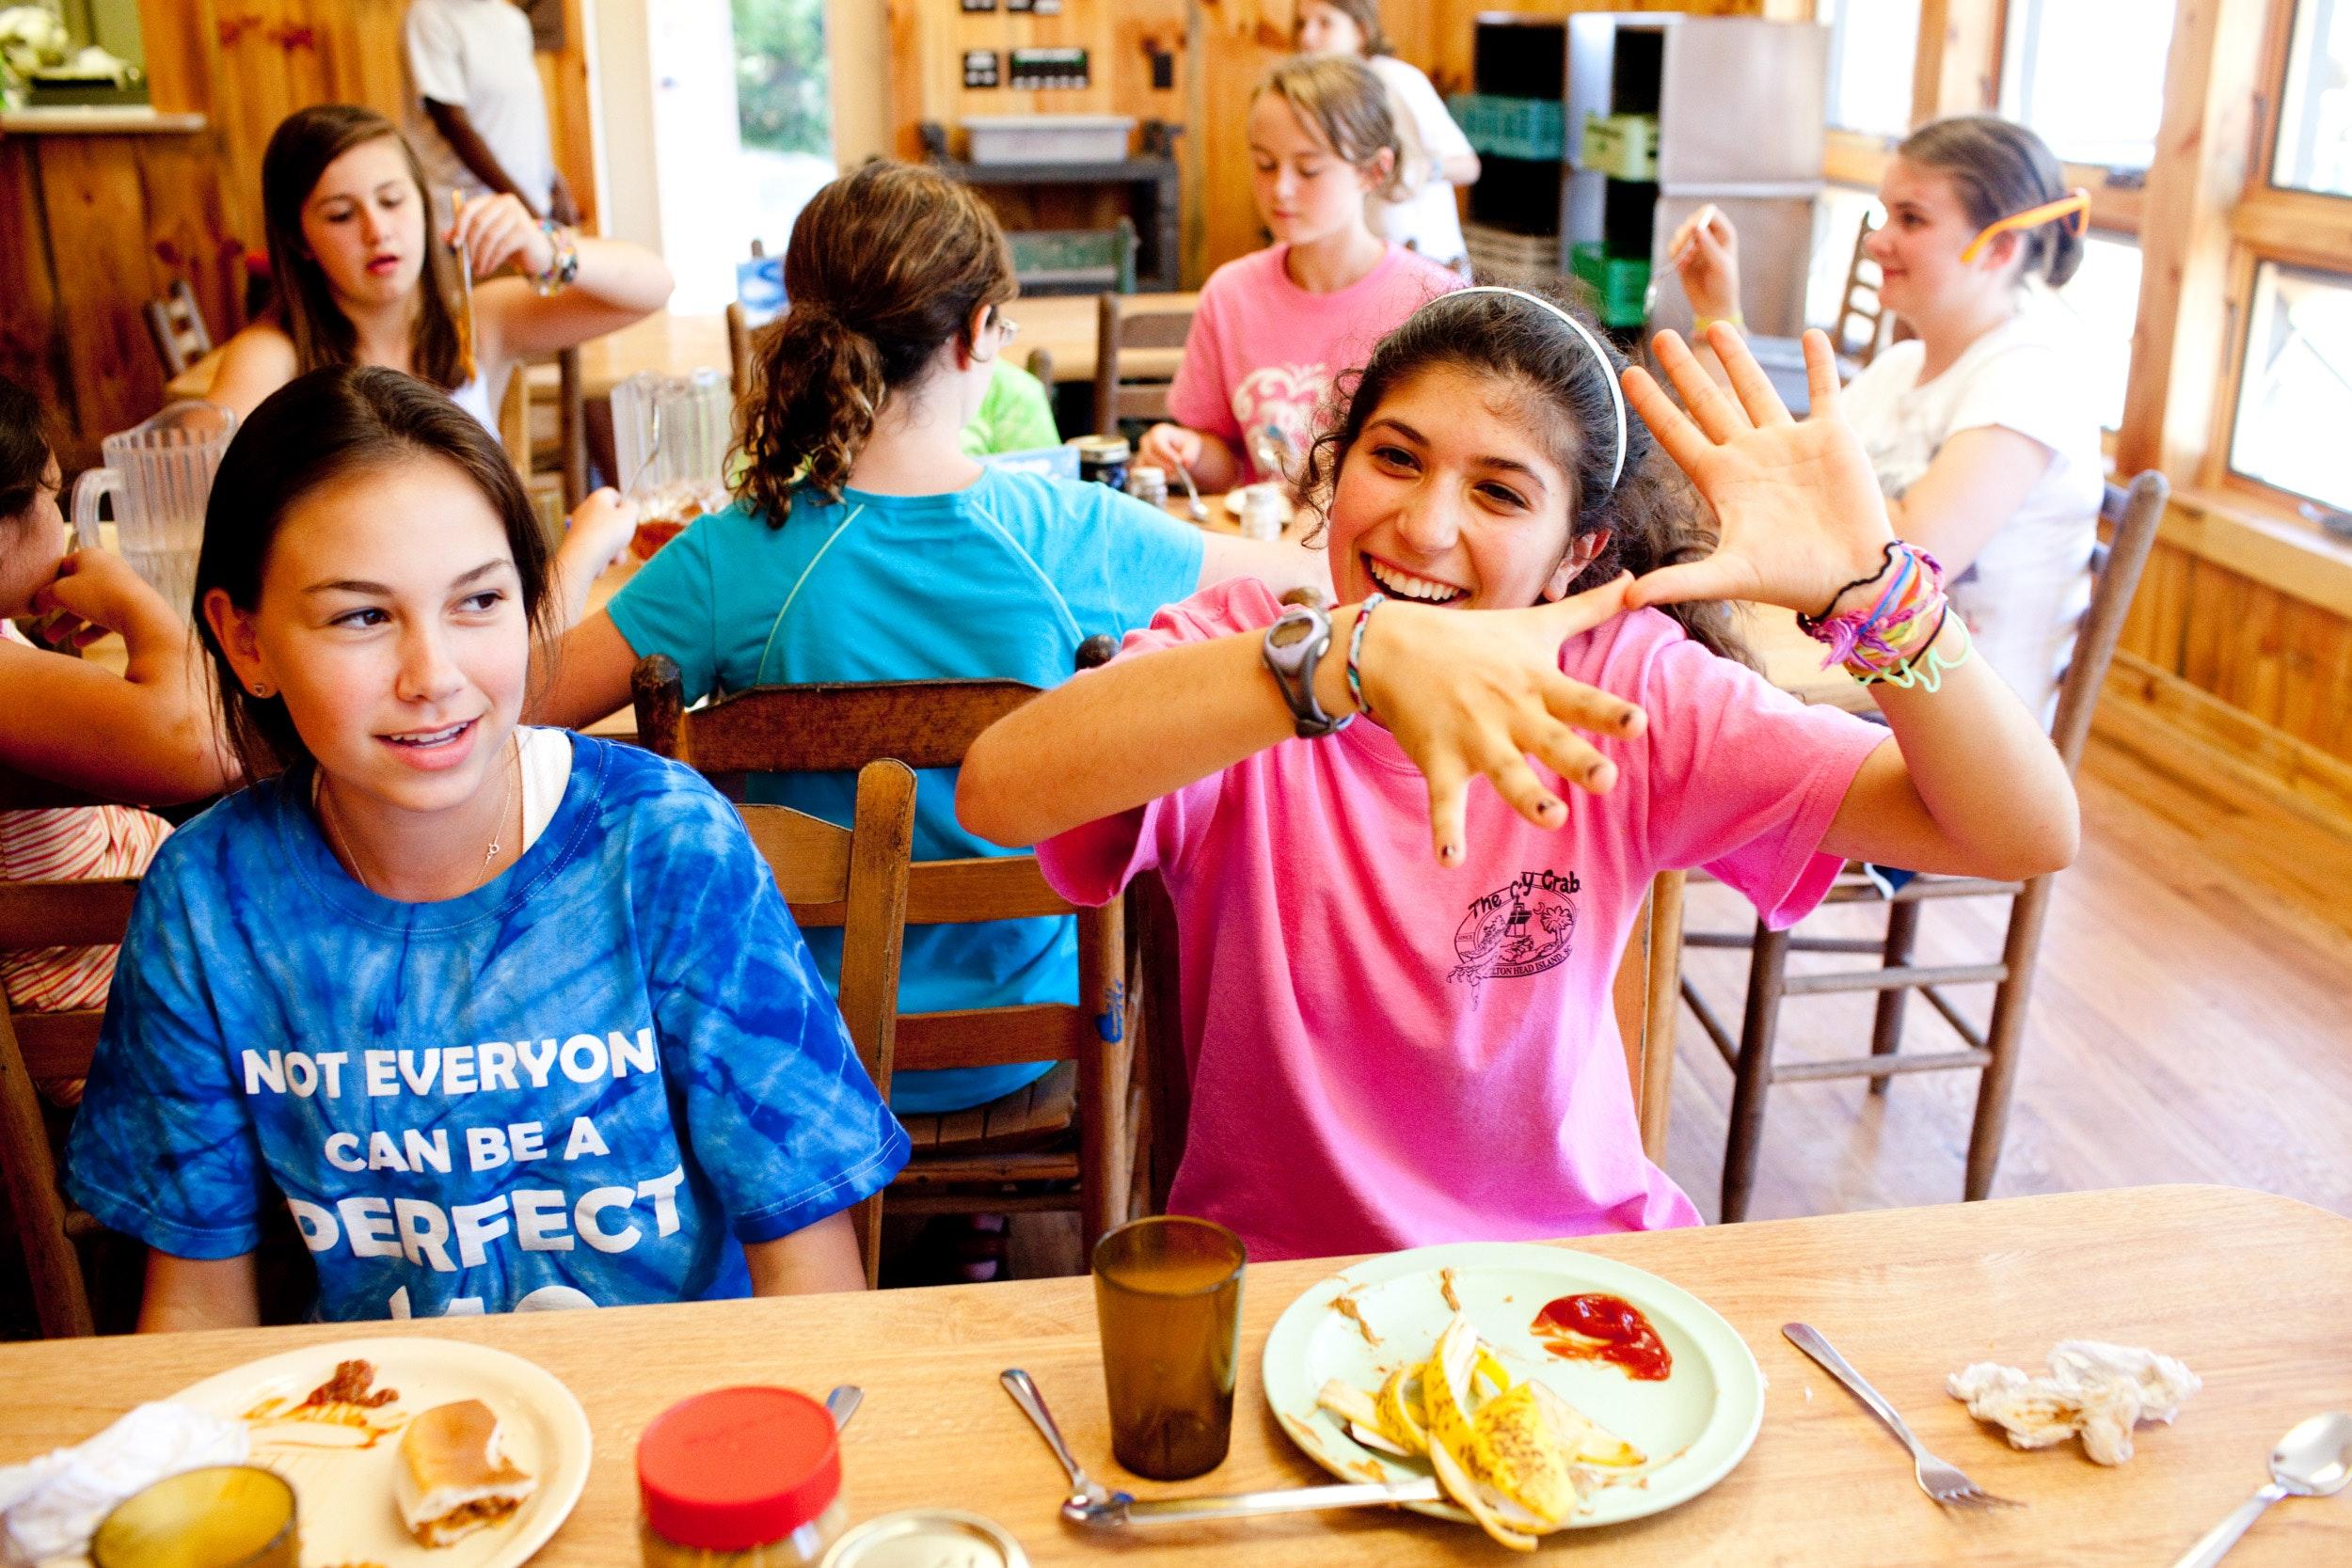 Fun eating at keystone summer camp for girls in north carolina.jpg?ixlib=rails 2.1